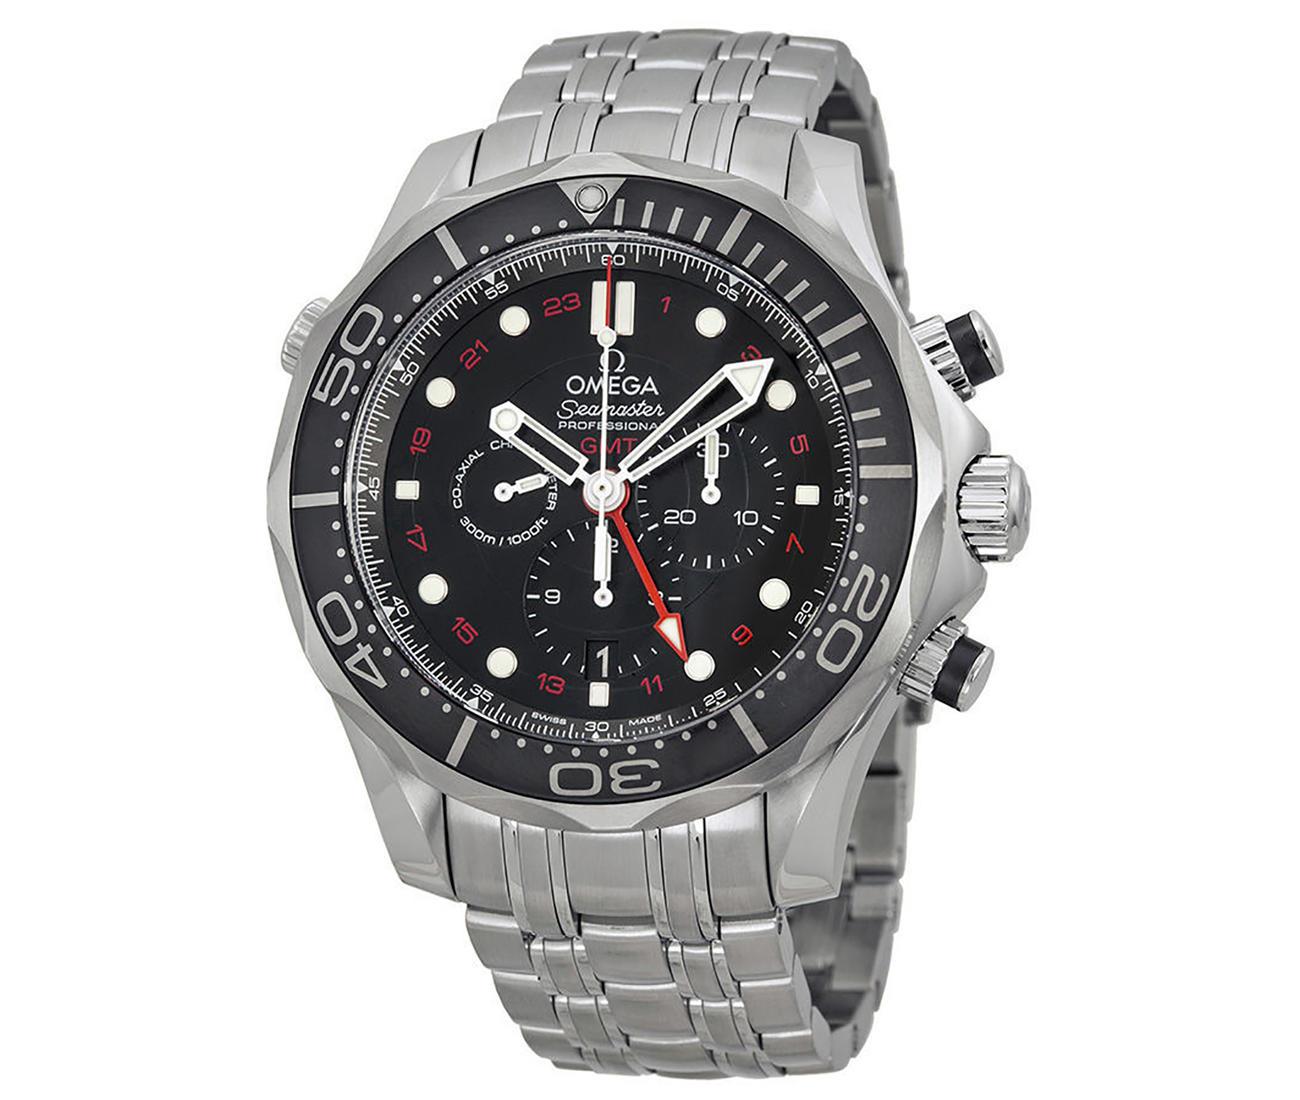 Diver 300 M Co-axial GMT Chronograph